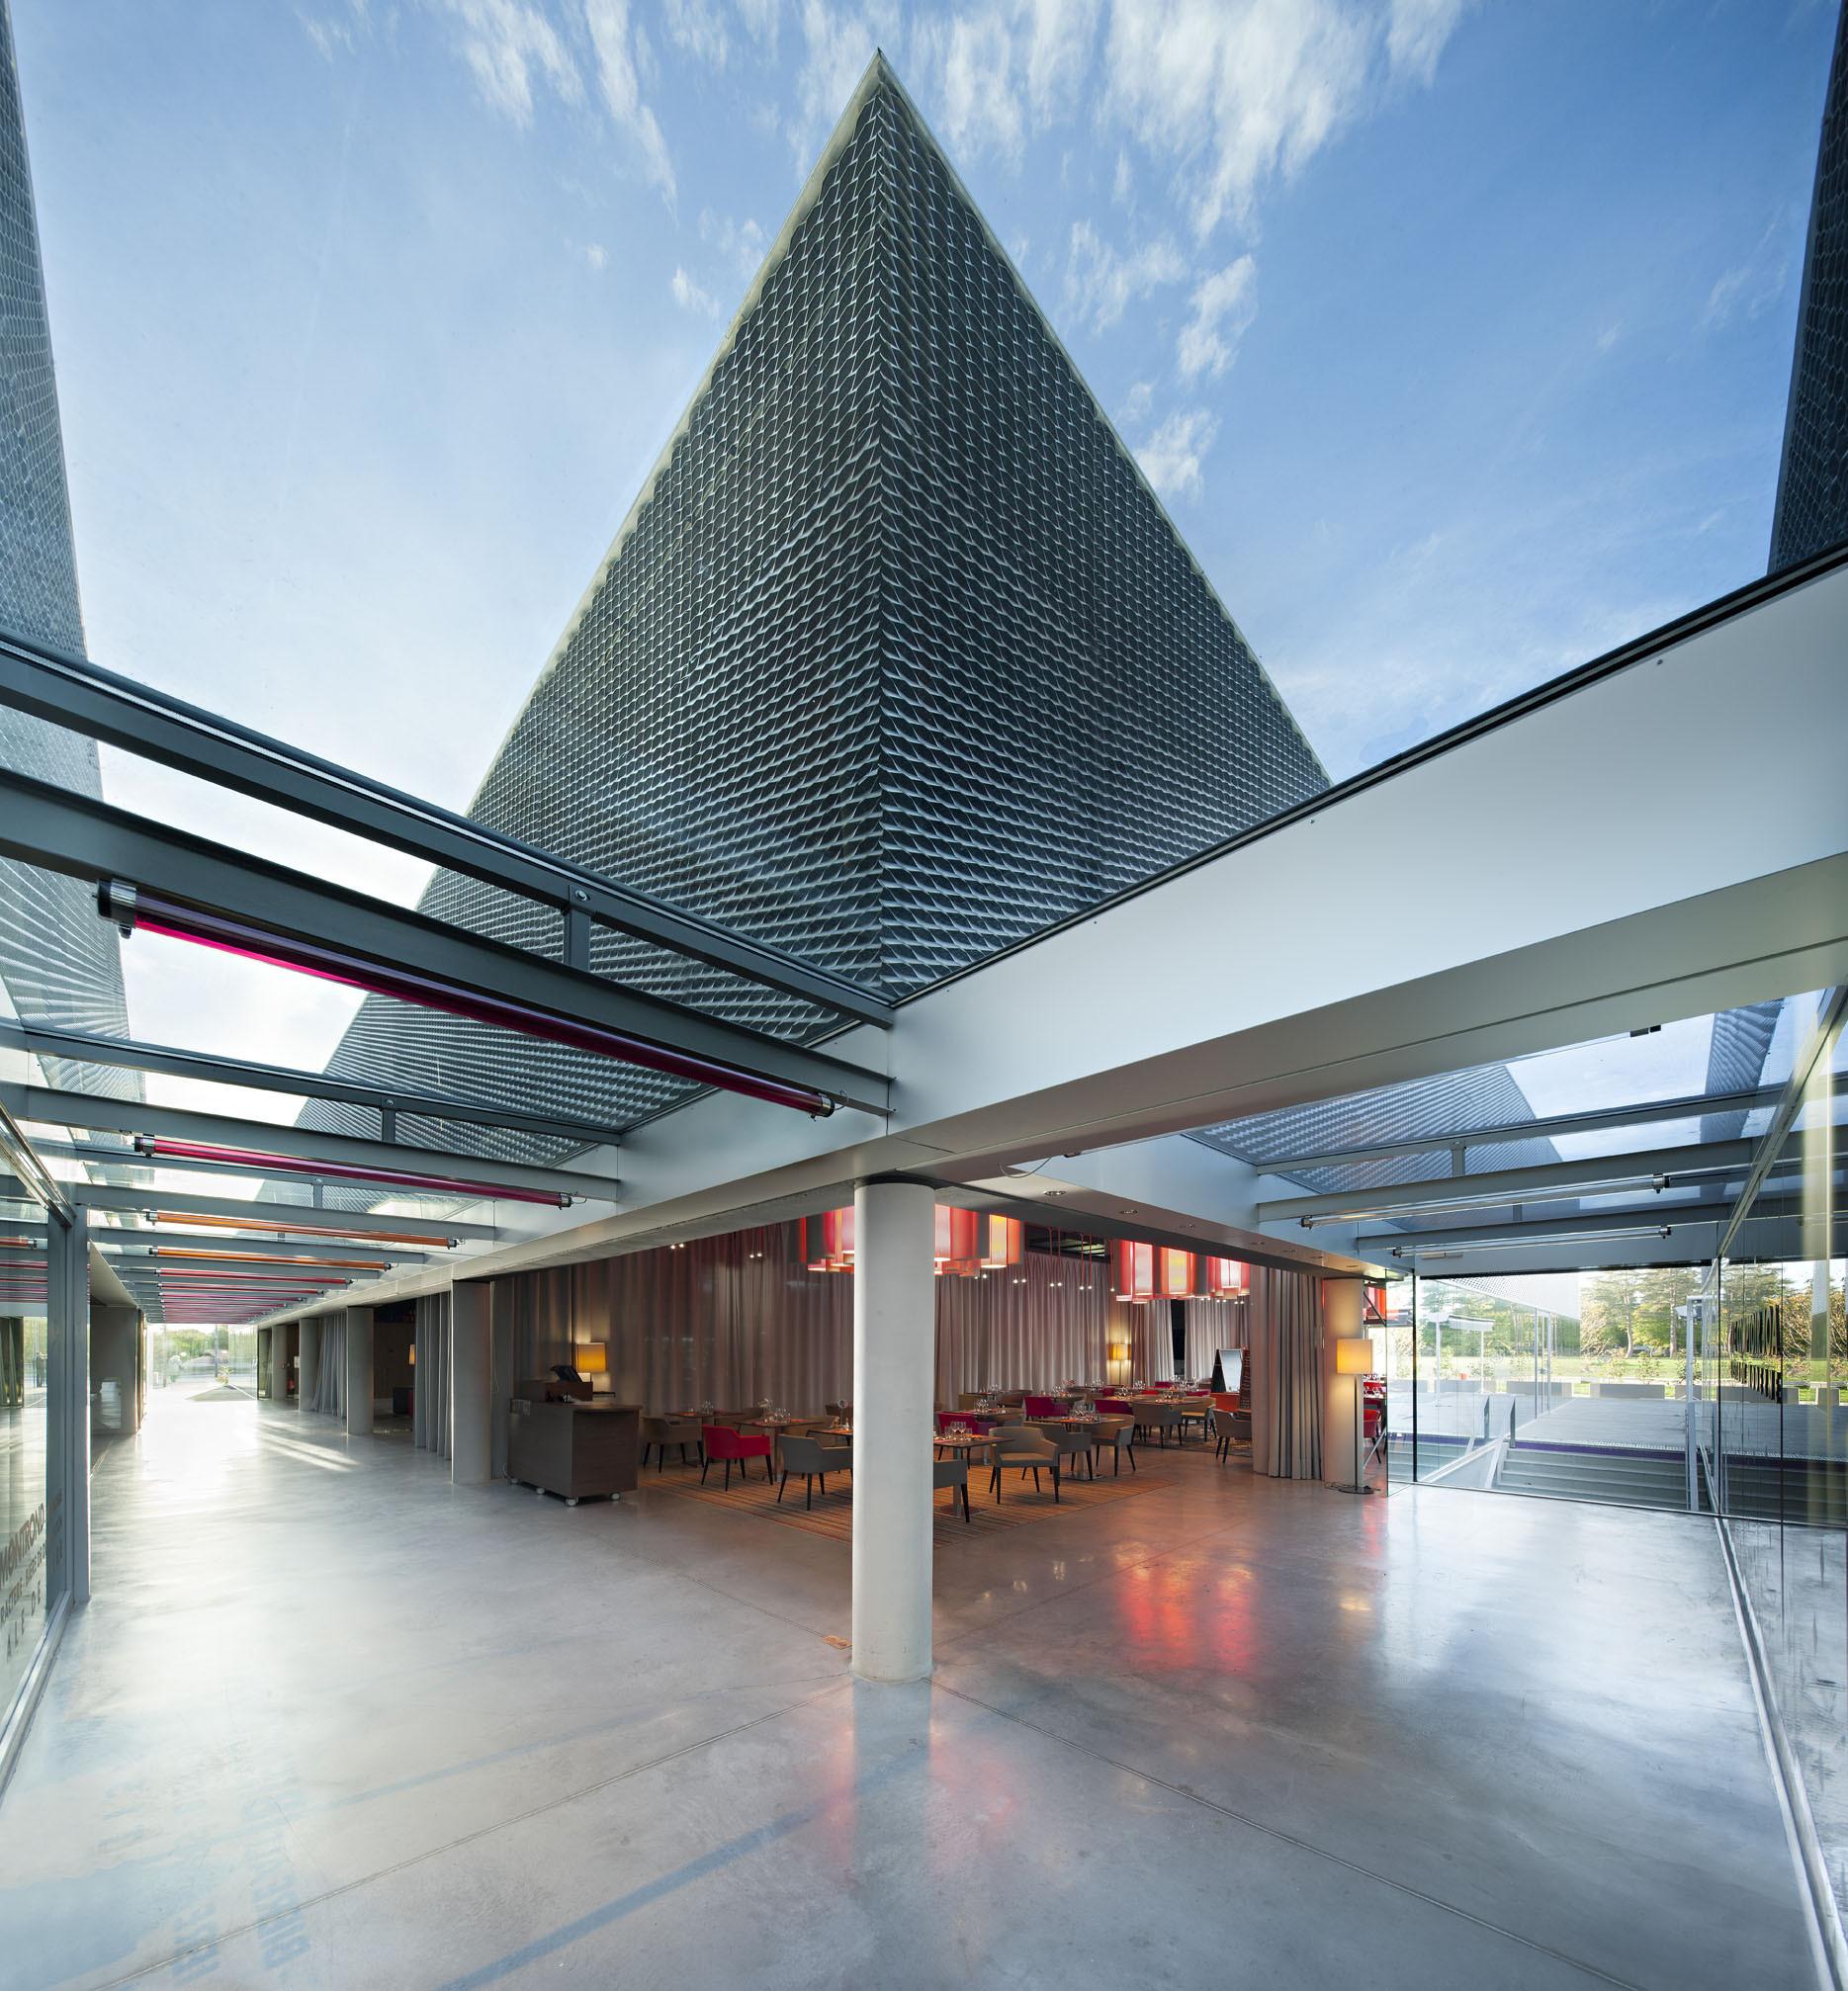 Montrond-les-Bains Casino  / DATA architectes, © Javier Callejas